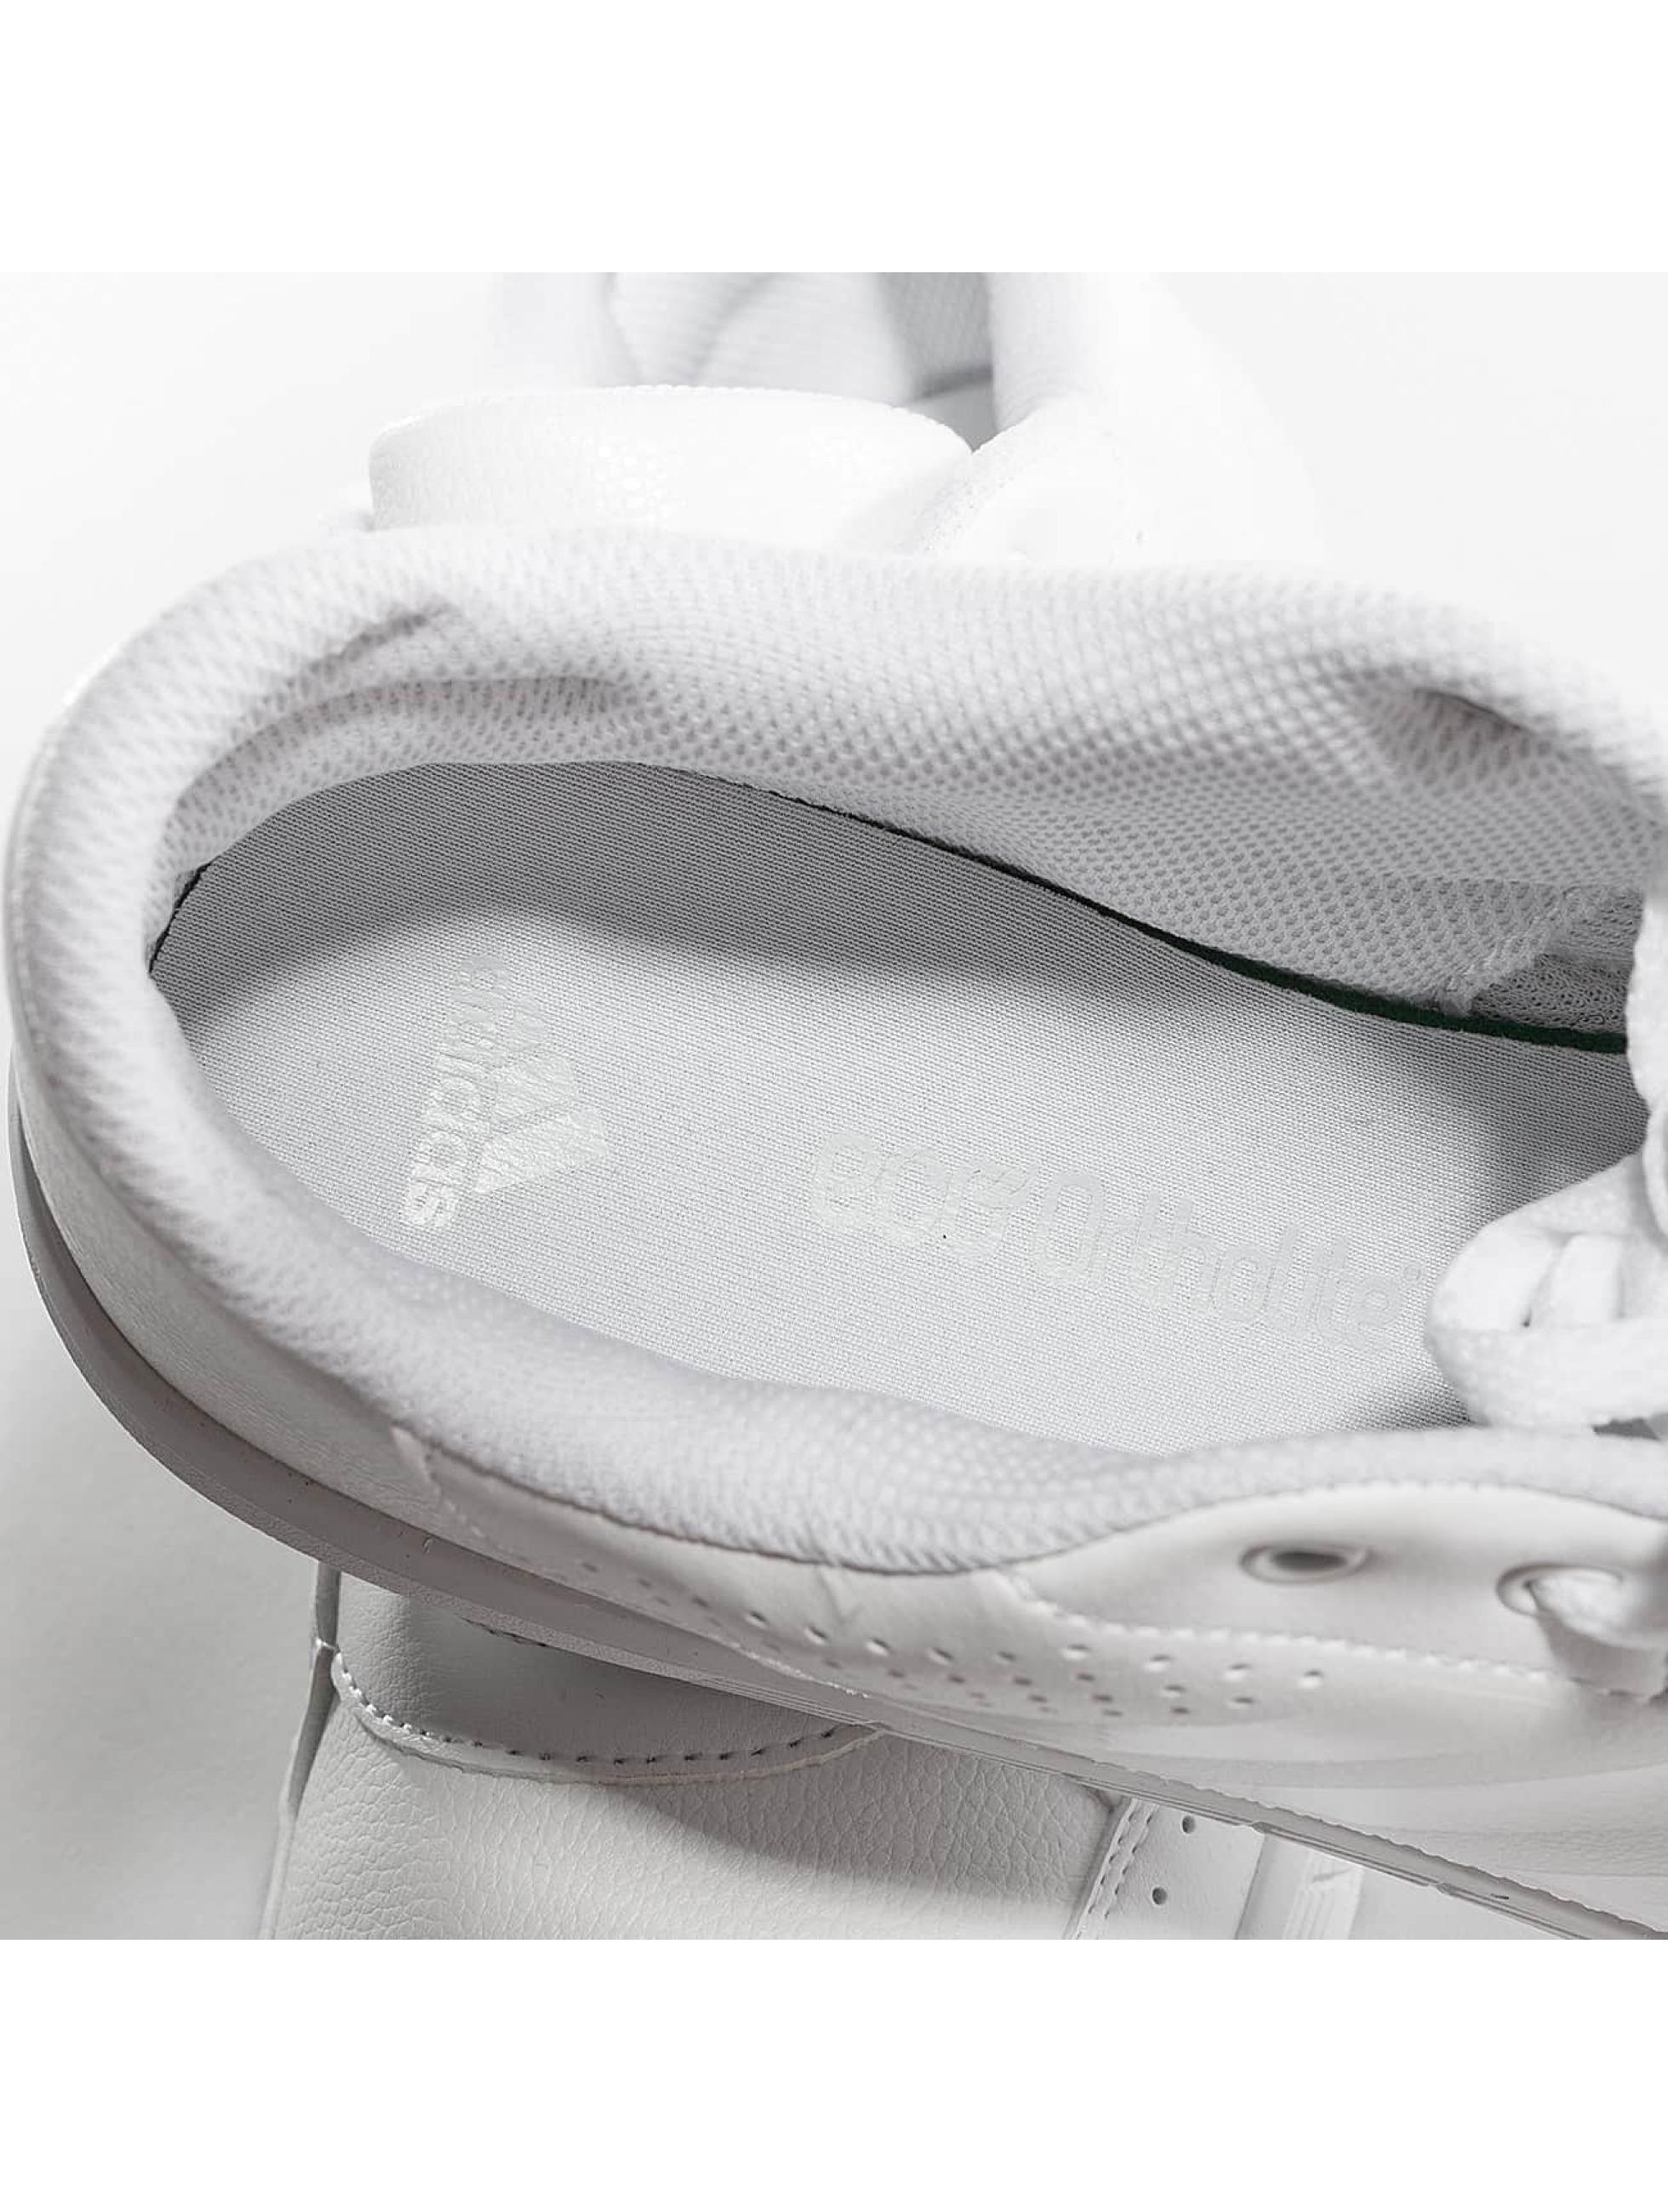 adidas Performance Tøysko Alta Sport hvit